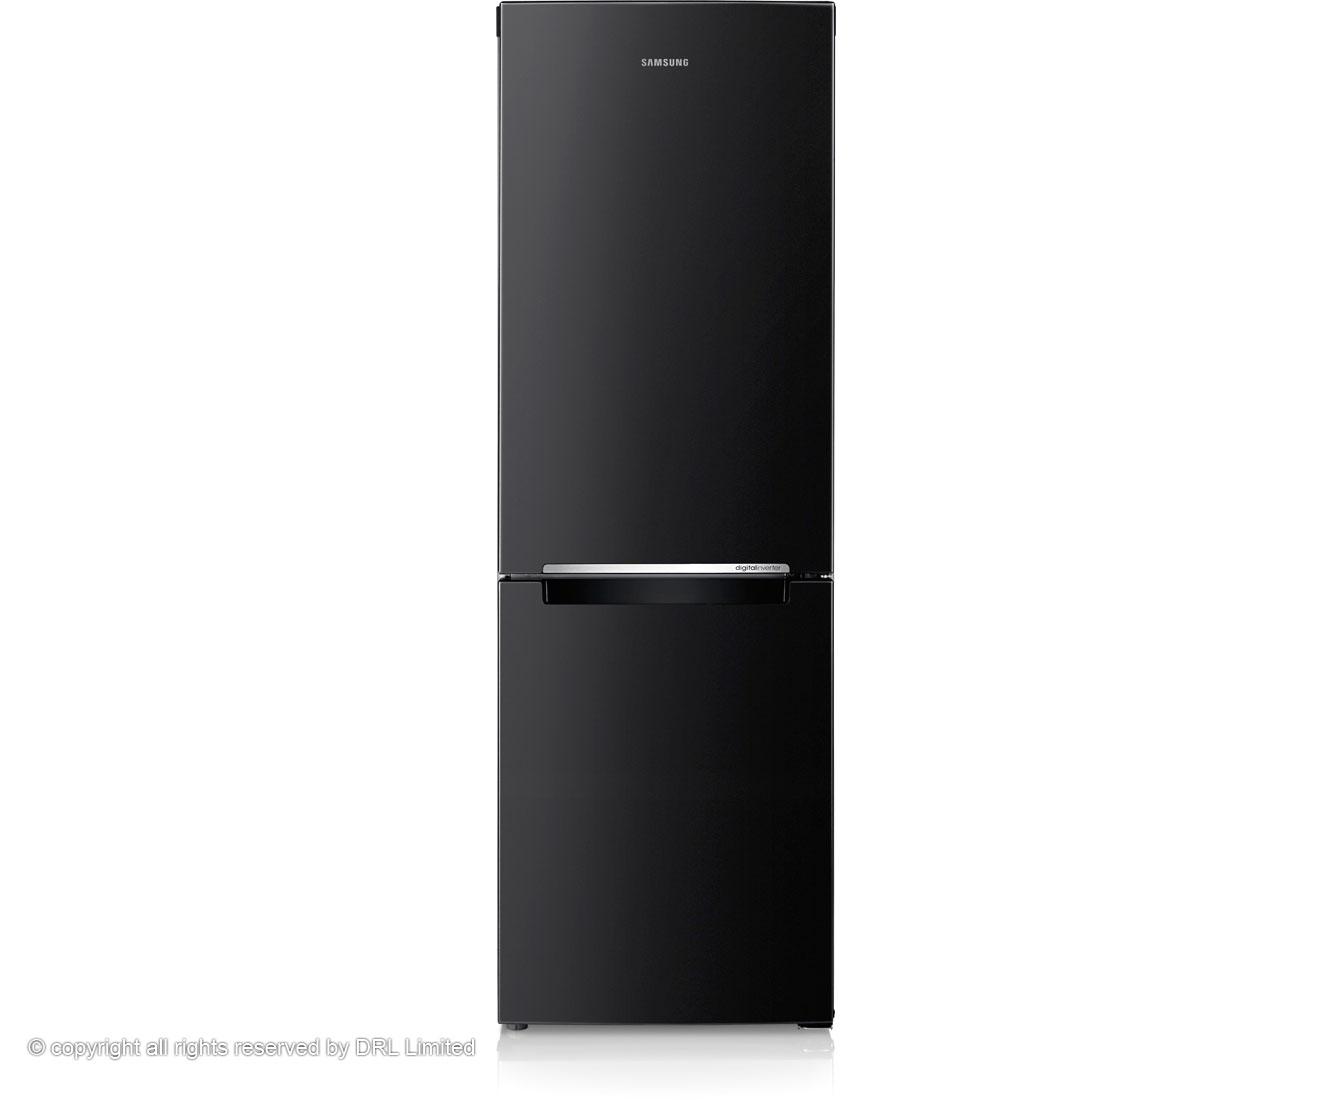 Samsung RB Combi Range RB29FSRNDBC Free Standing Fridge Freezer Frost Free in Black